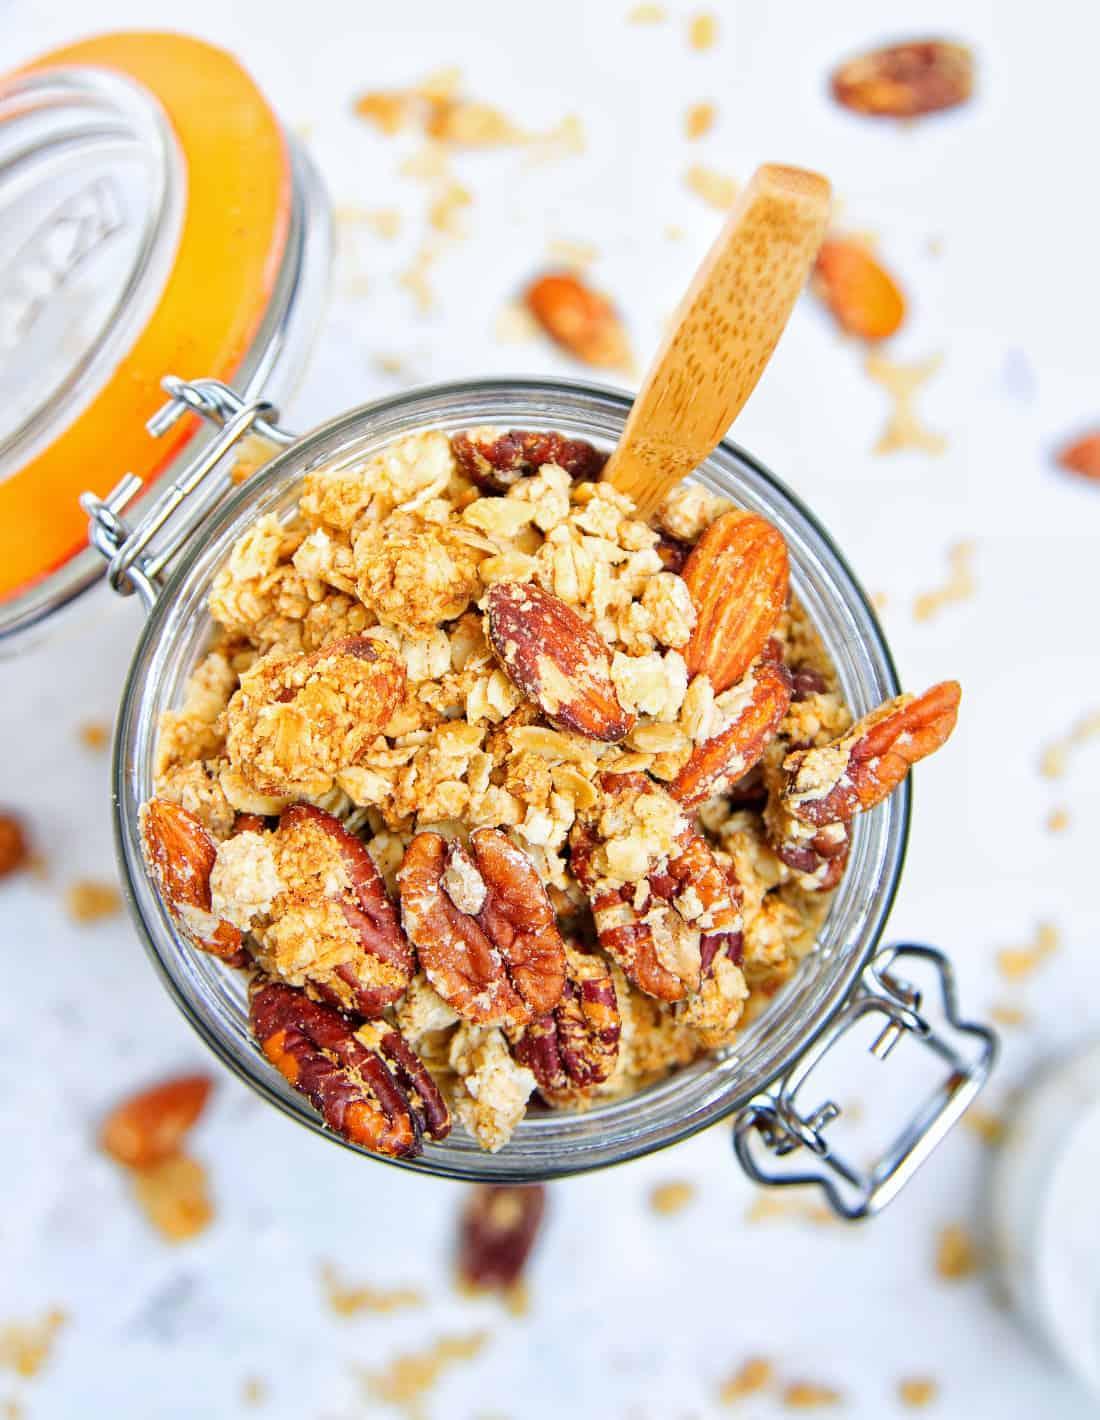 Crunchy Peanut Butter Granola Kilner Top